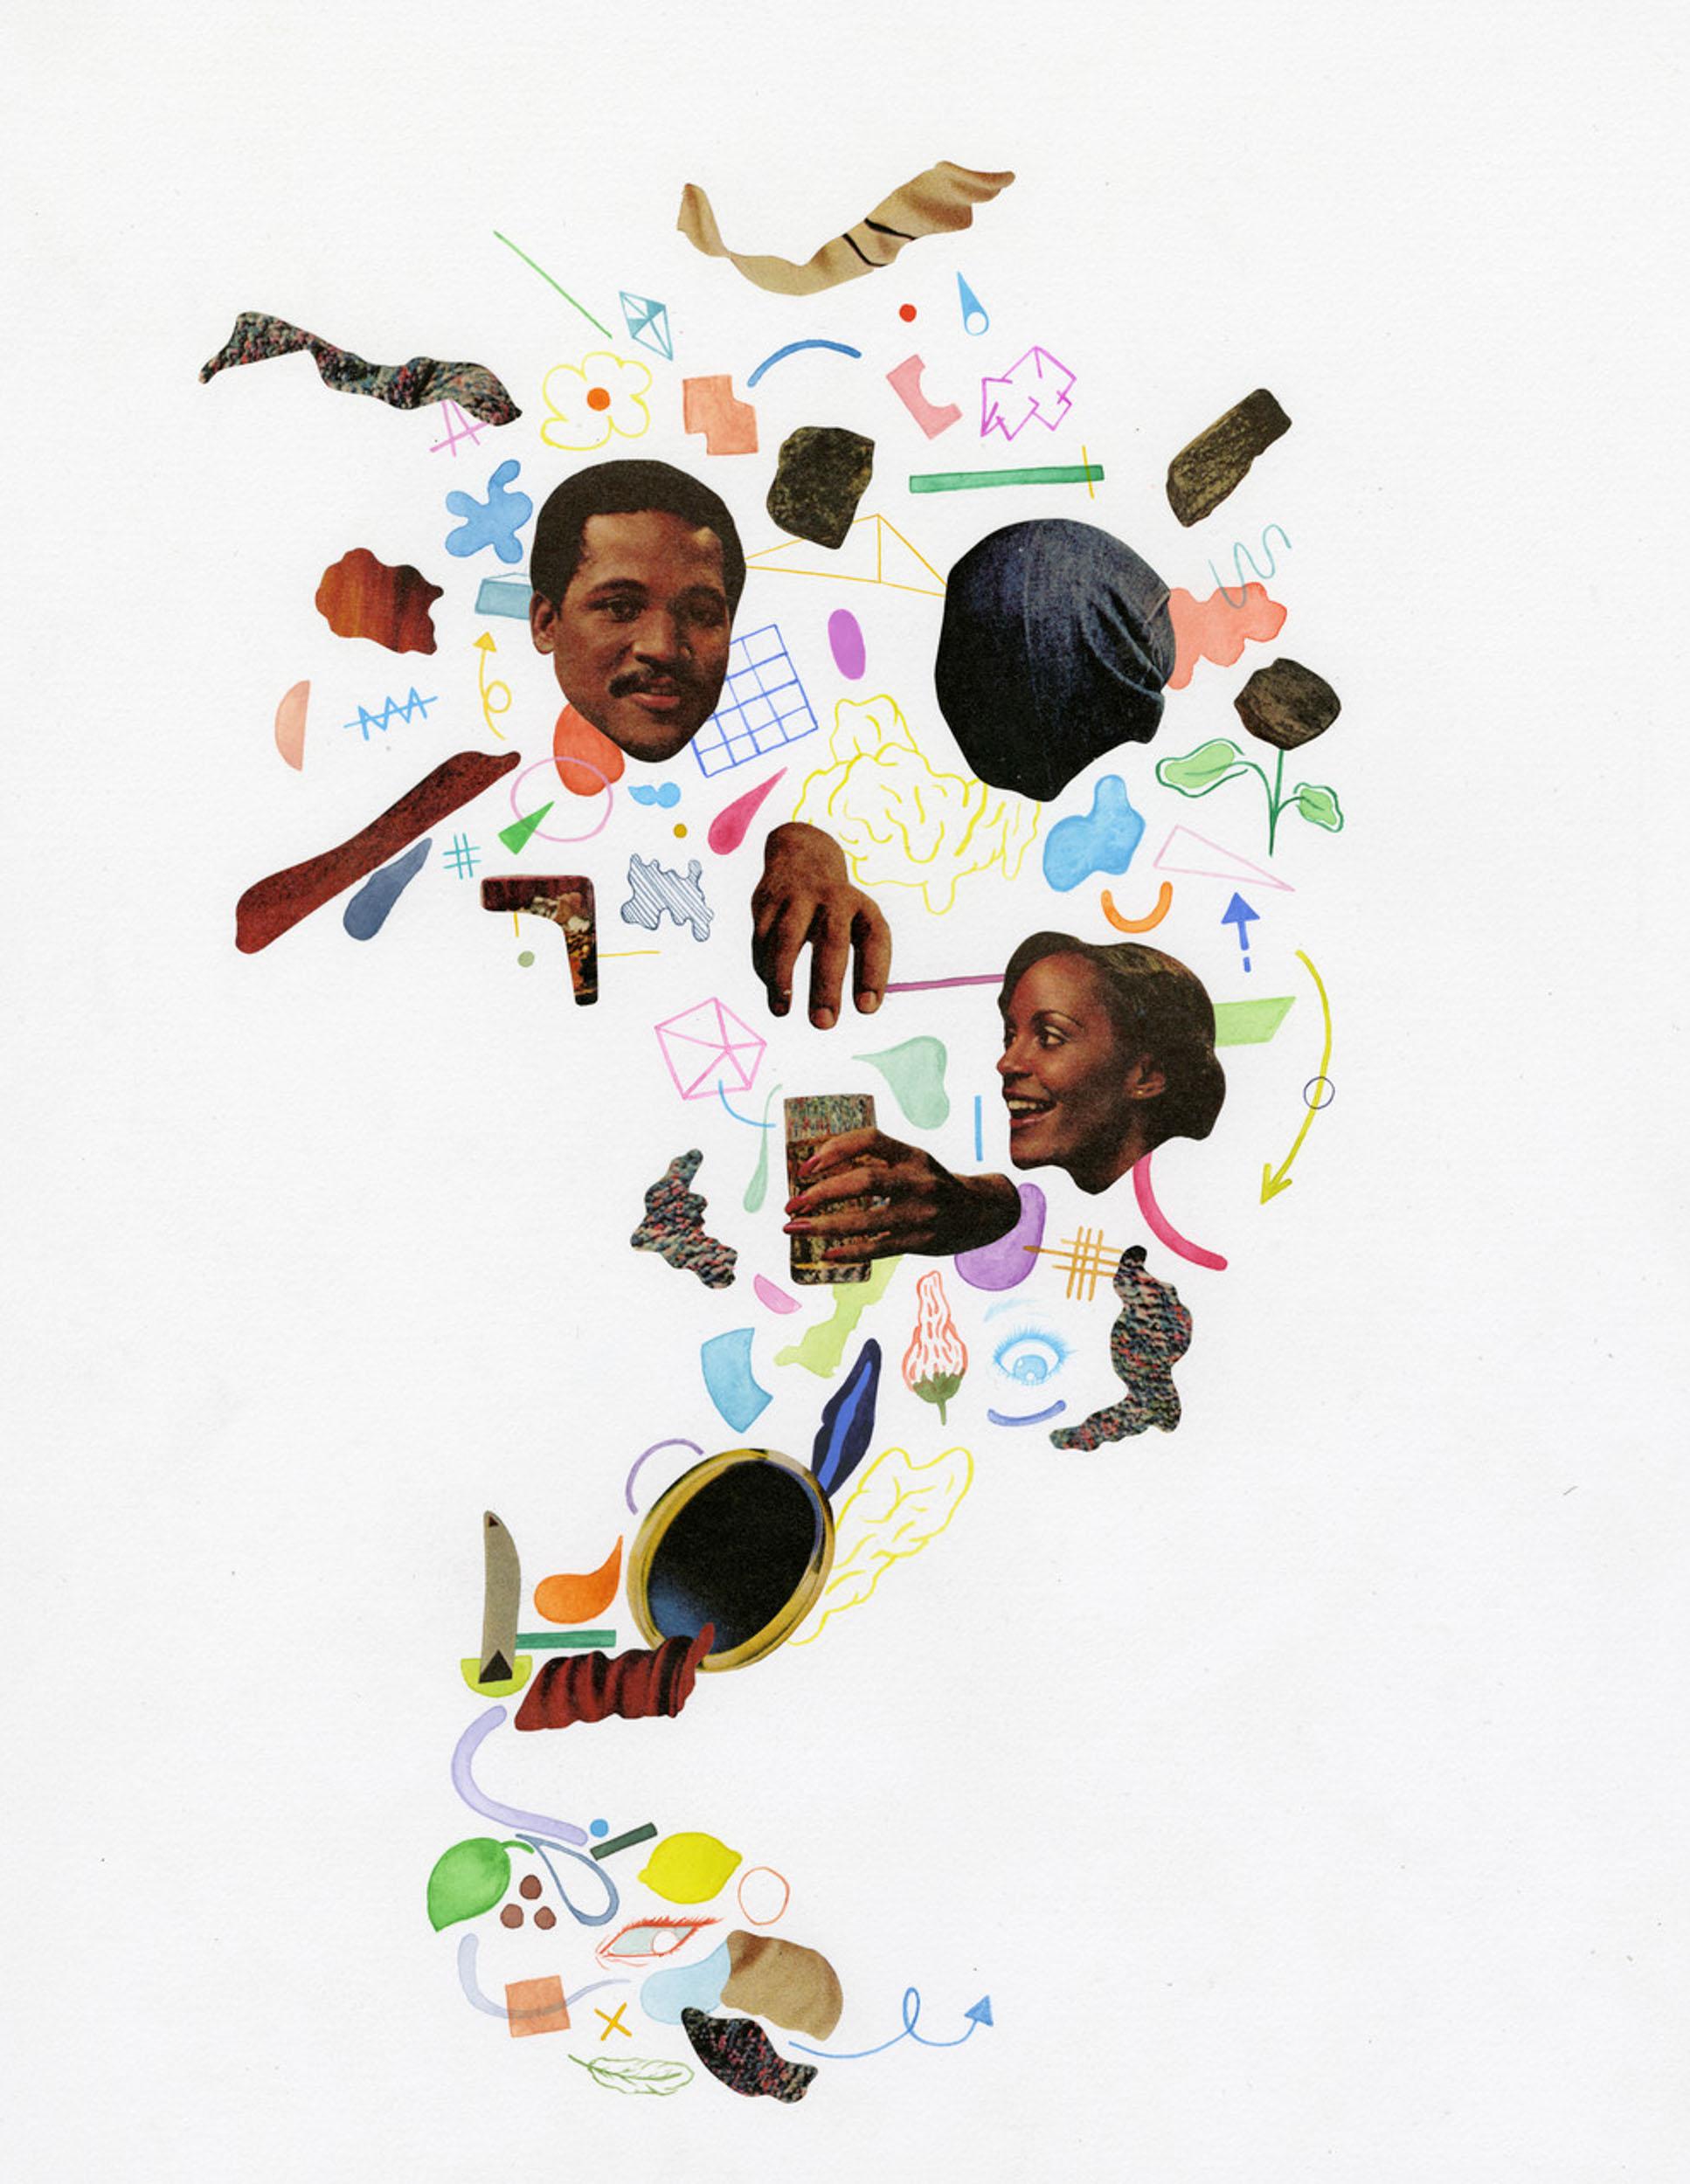 wassaic-project-artist-dana-robinson-love-american-style-2019-04-03-08-00-32.jpg